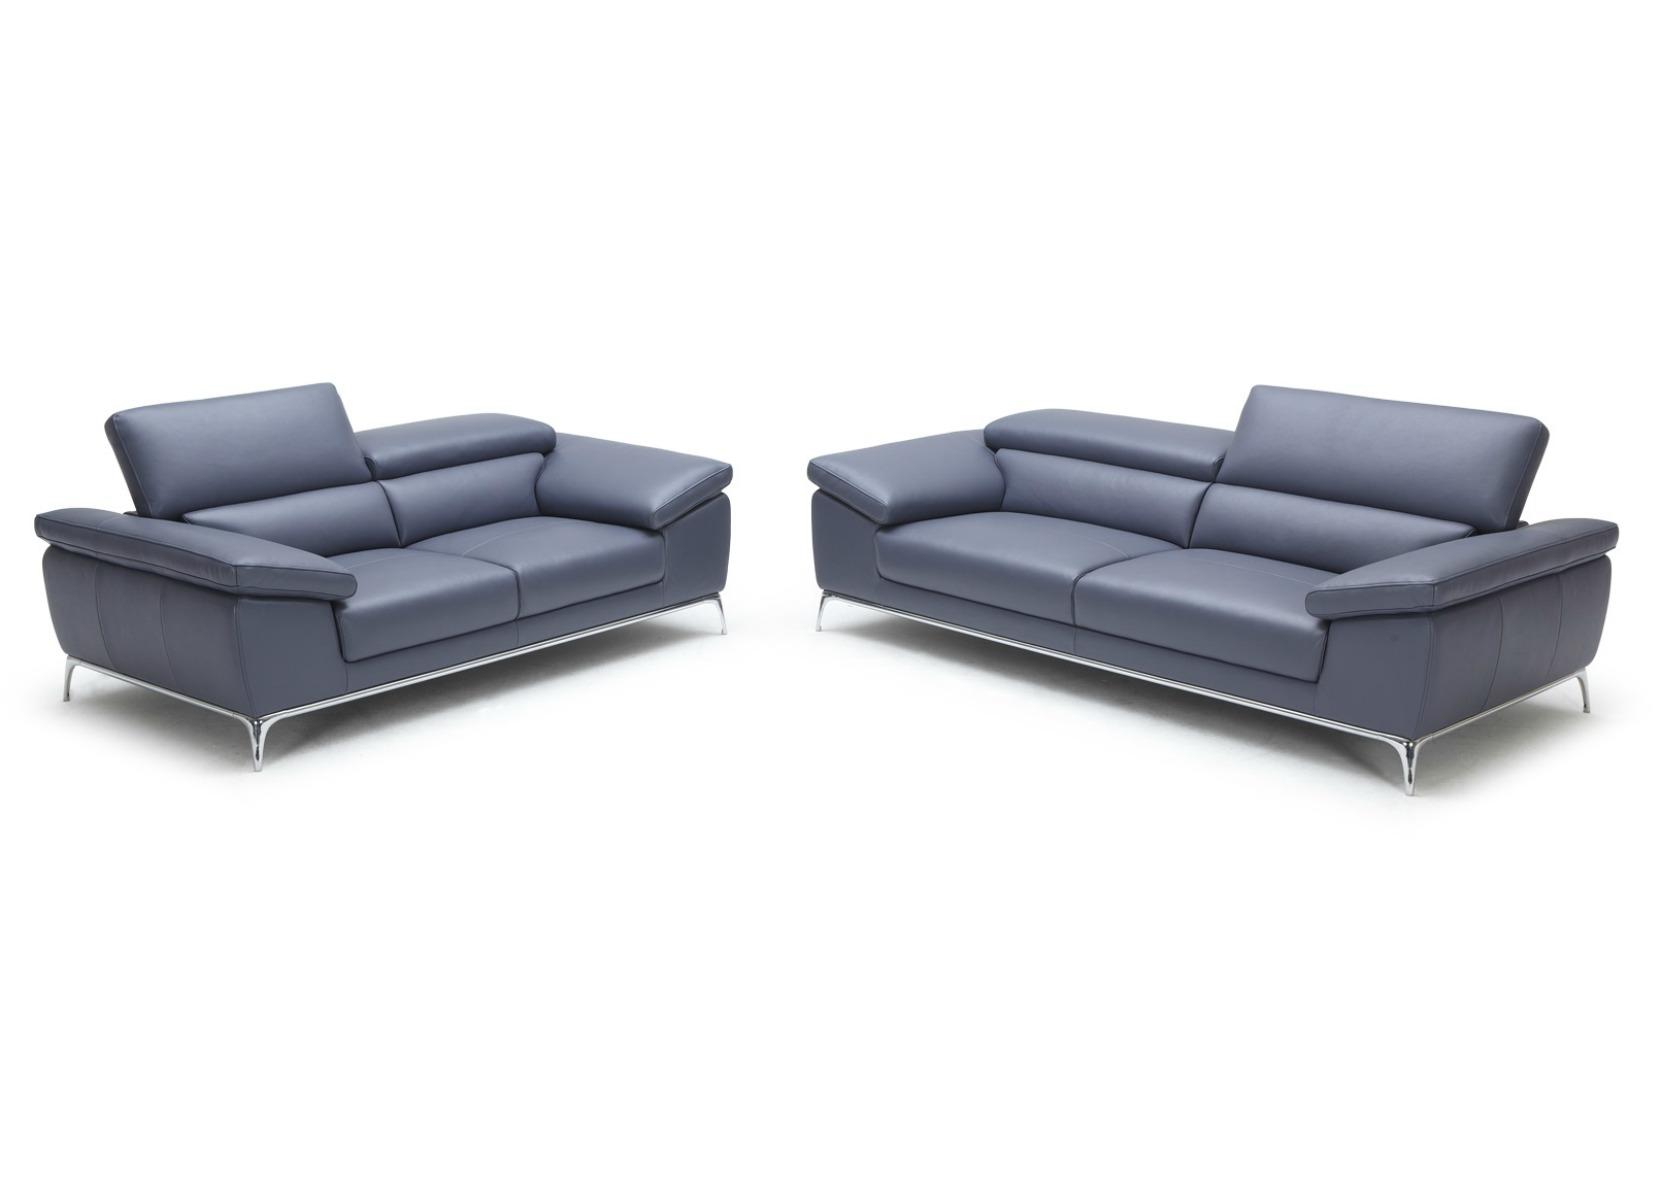 Ebora Sofa With Adjustable Headrest Not Just Brown